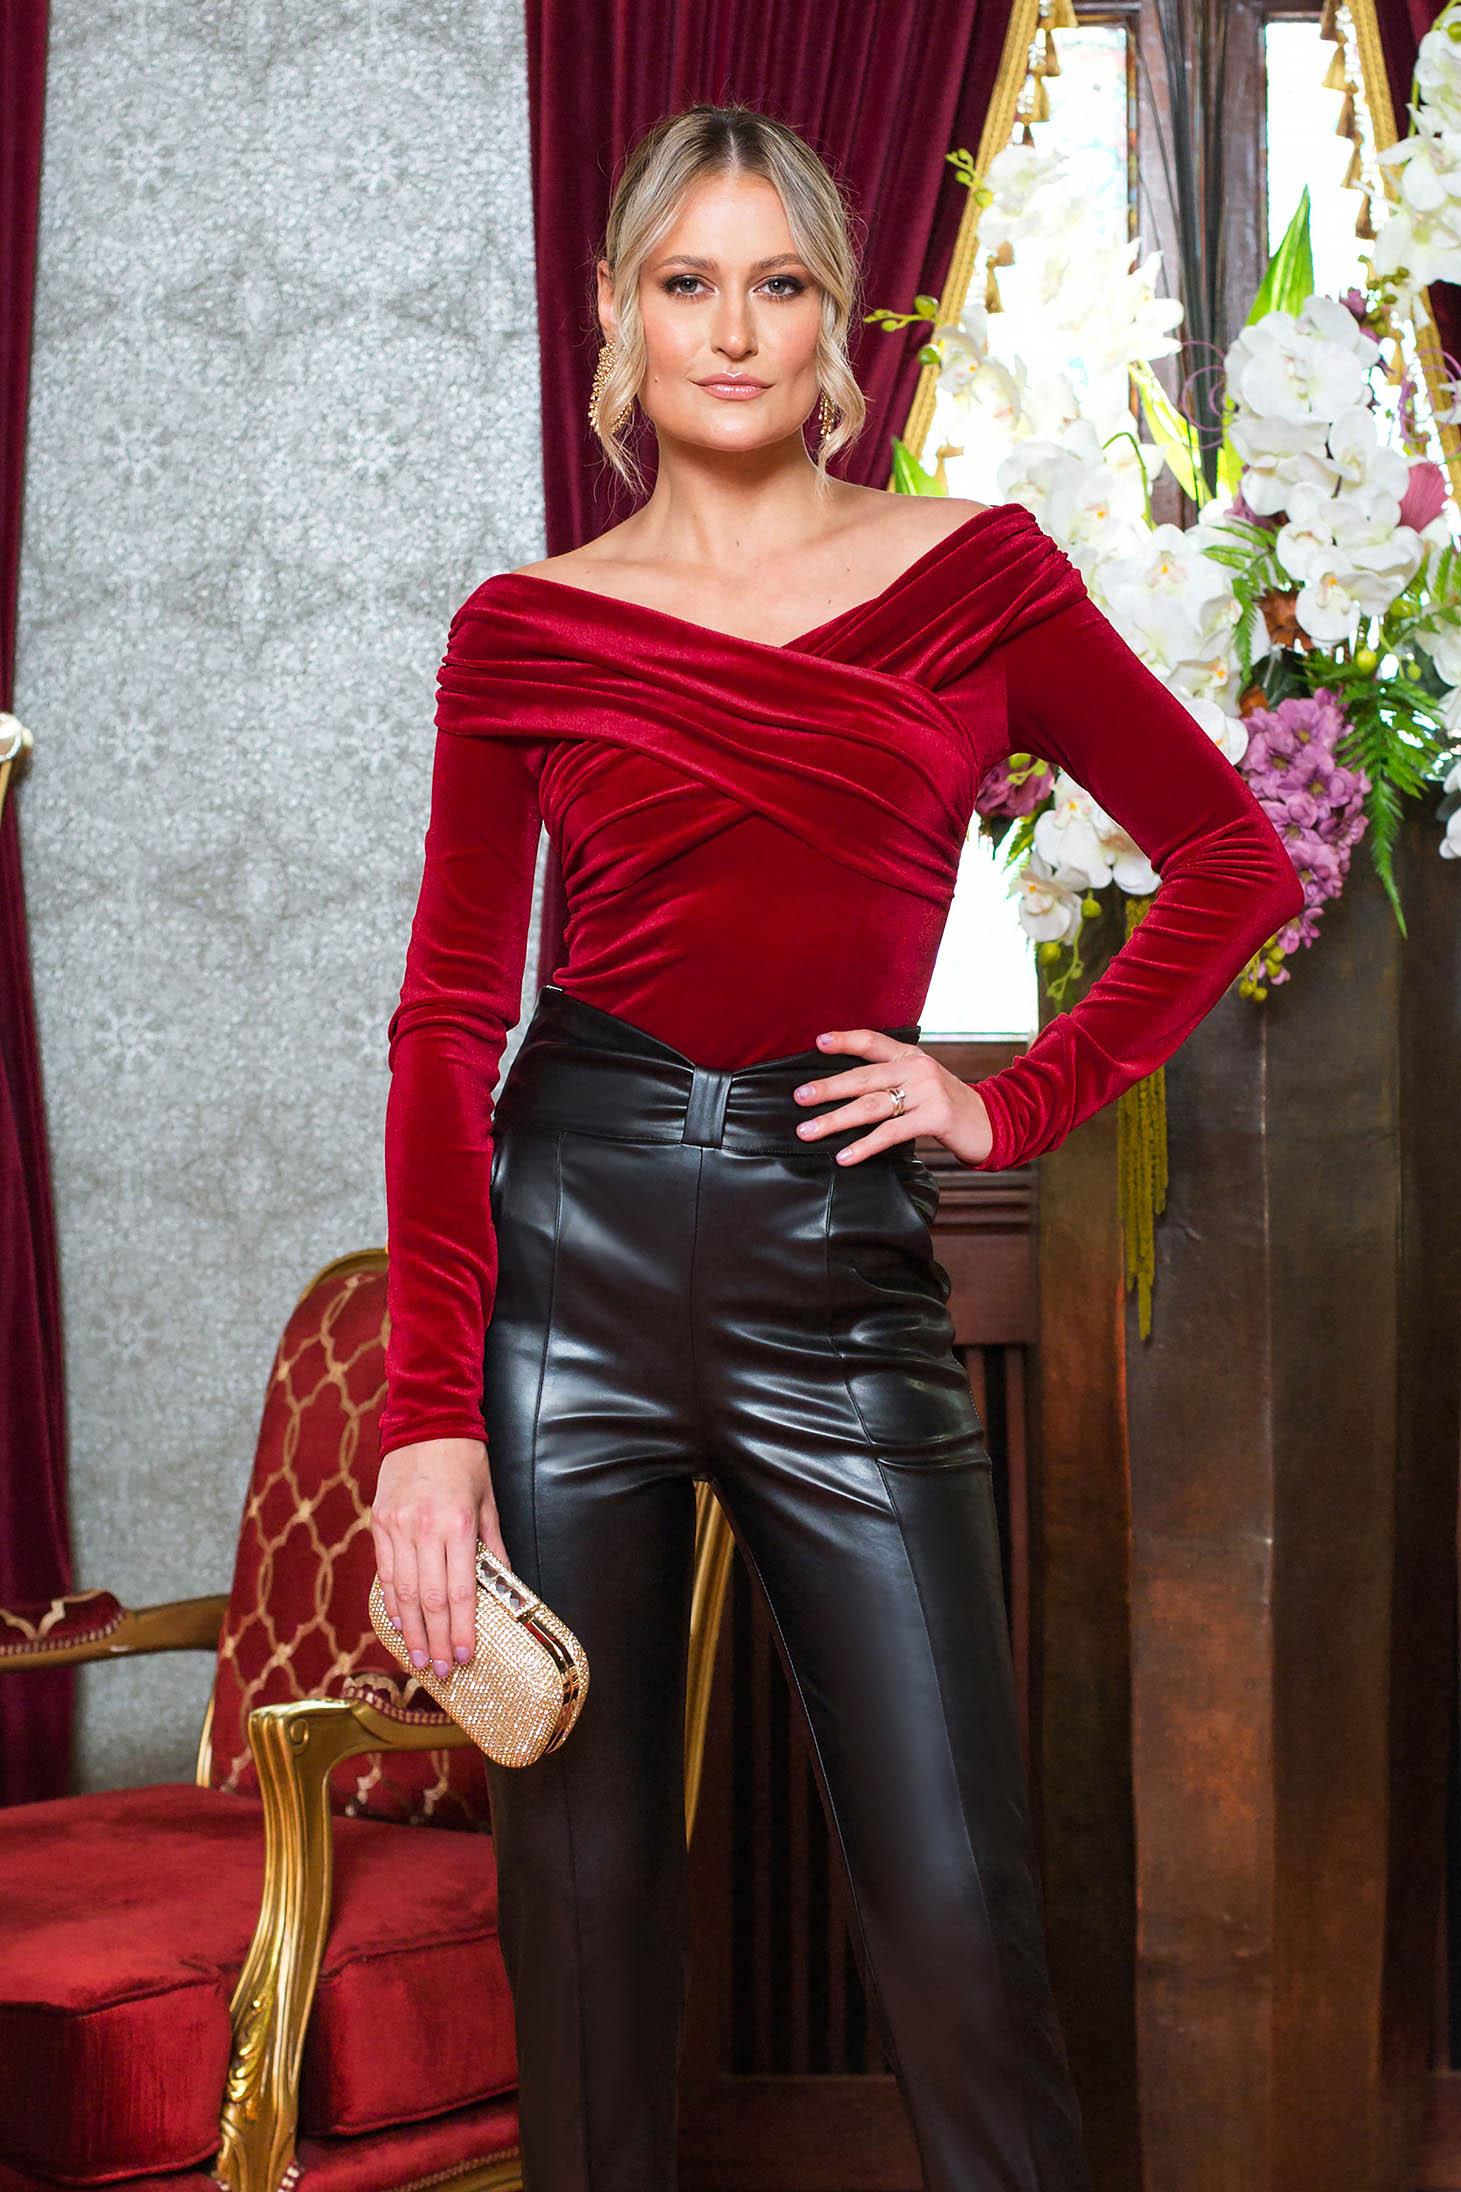 Red women`s blouse clubbing from velvet naked shoulders long sleeved tented